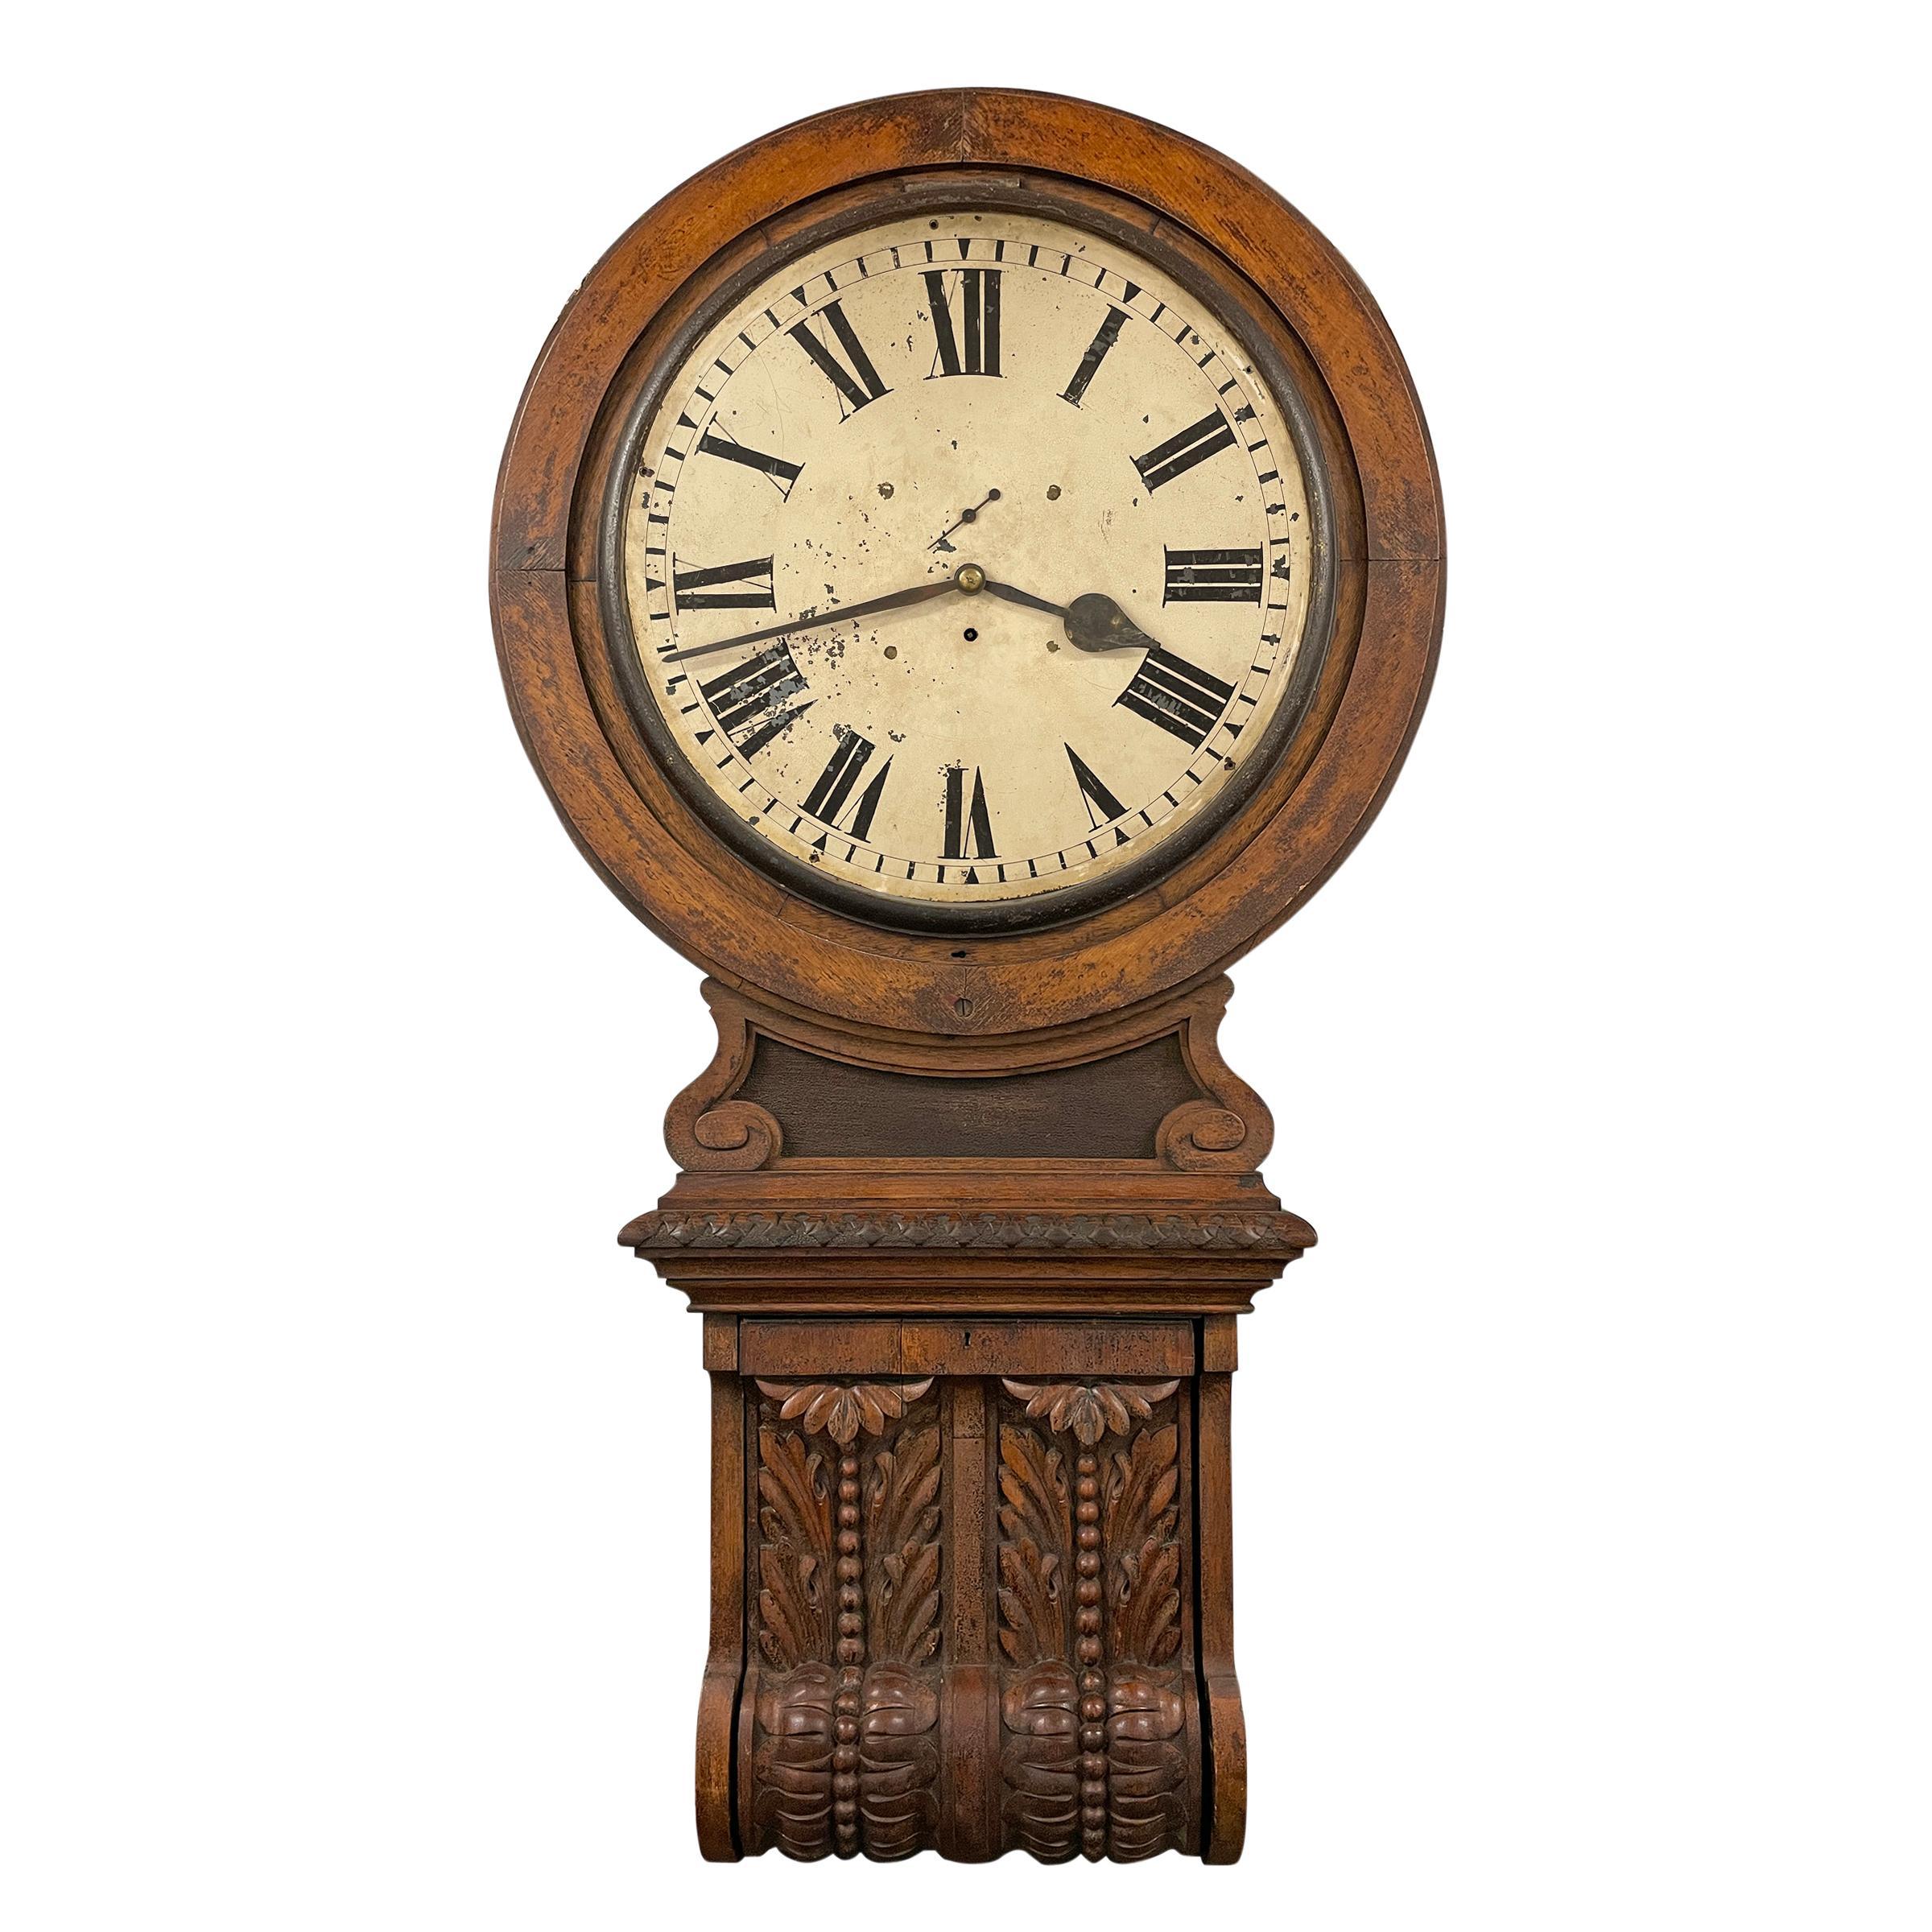 Massive 19th Century English Railroad Station Clock